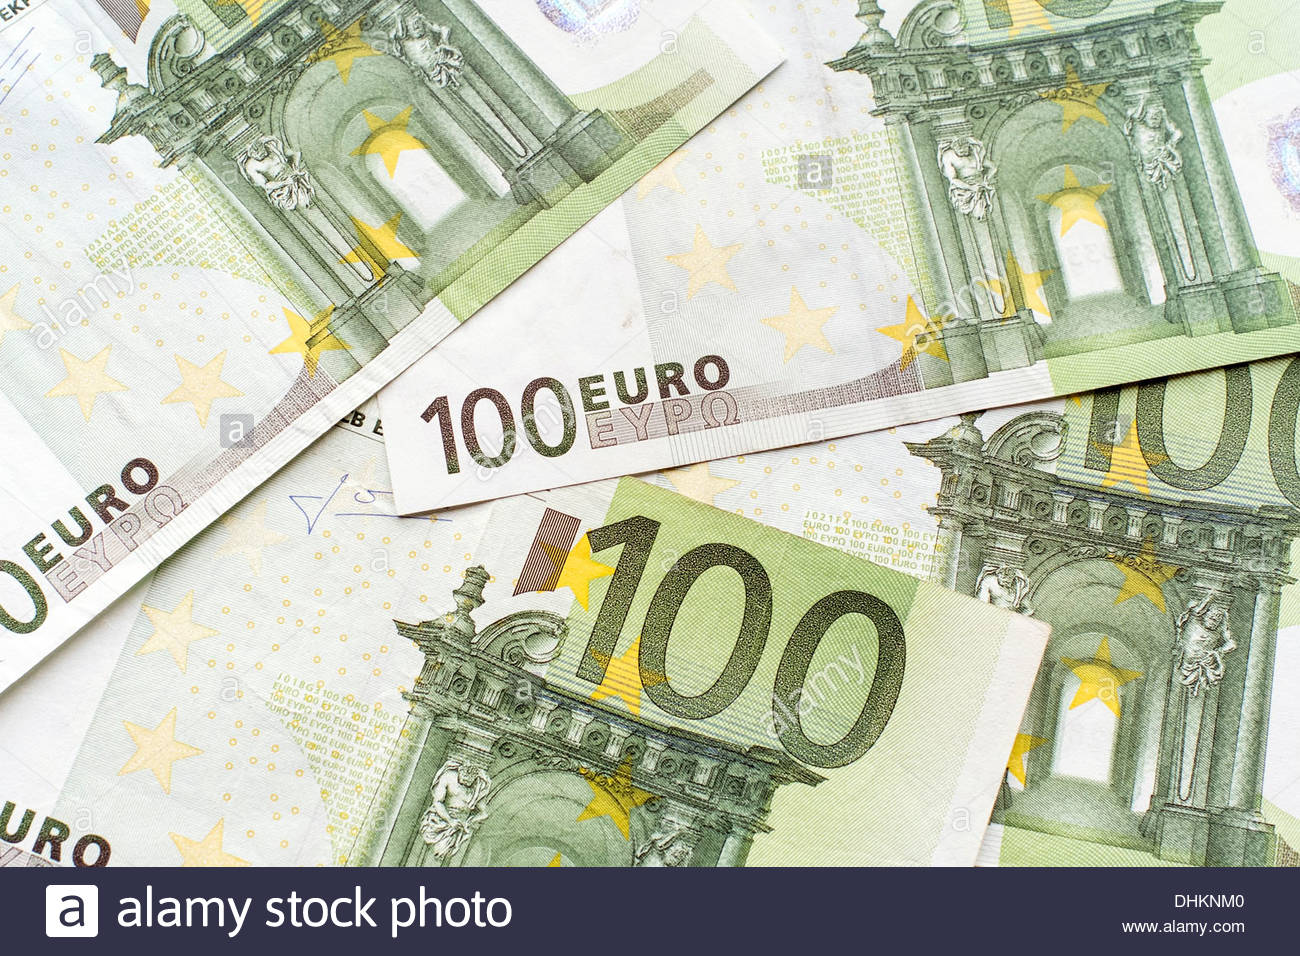 One-hundred Euro bills - Stock Image